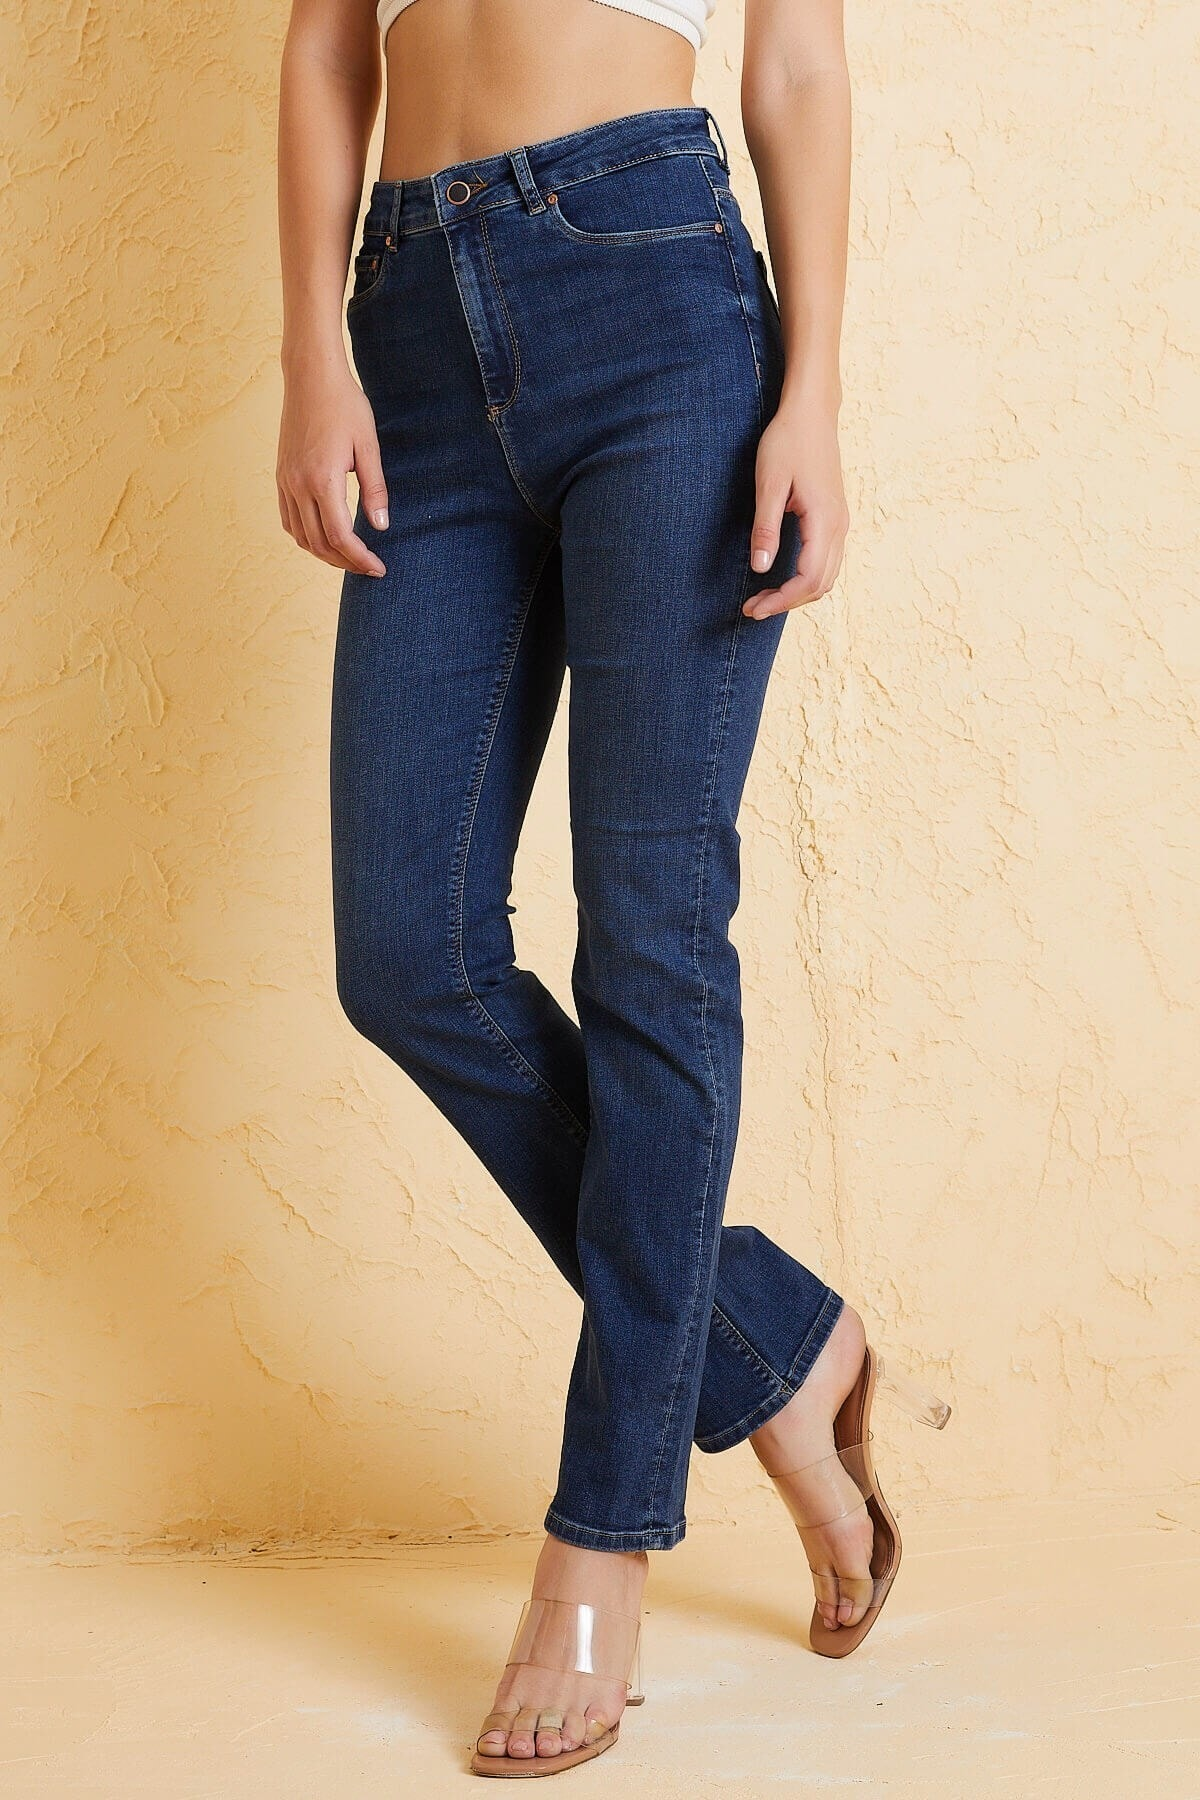 Twister Jeans Kadın Mavi Marta Jean 9269-2658-05 2